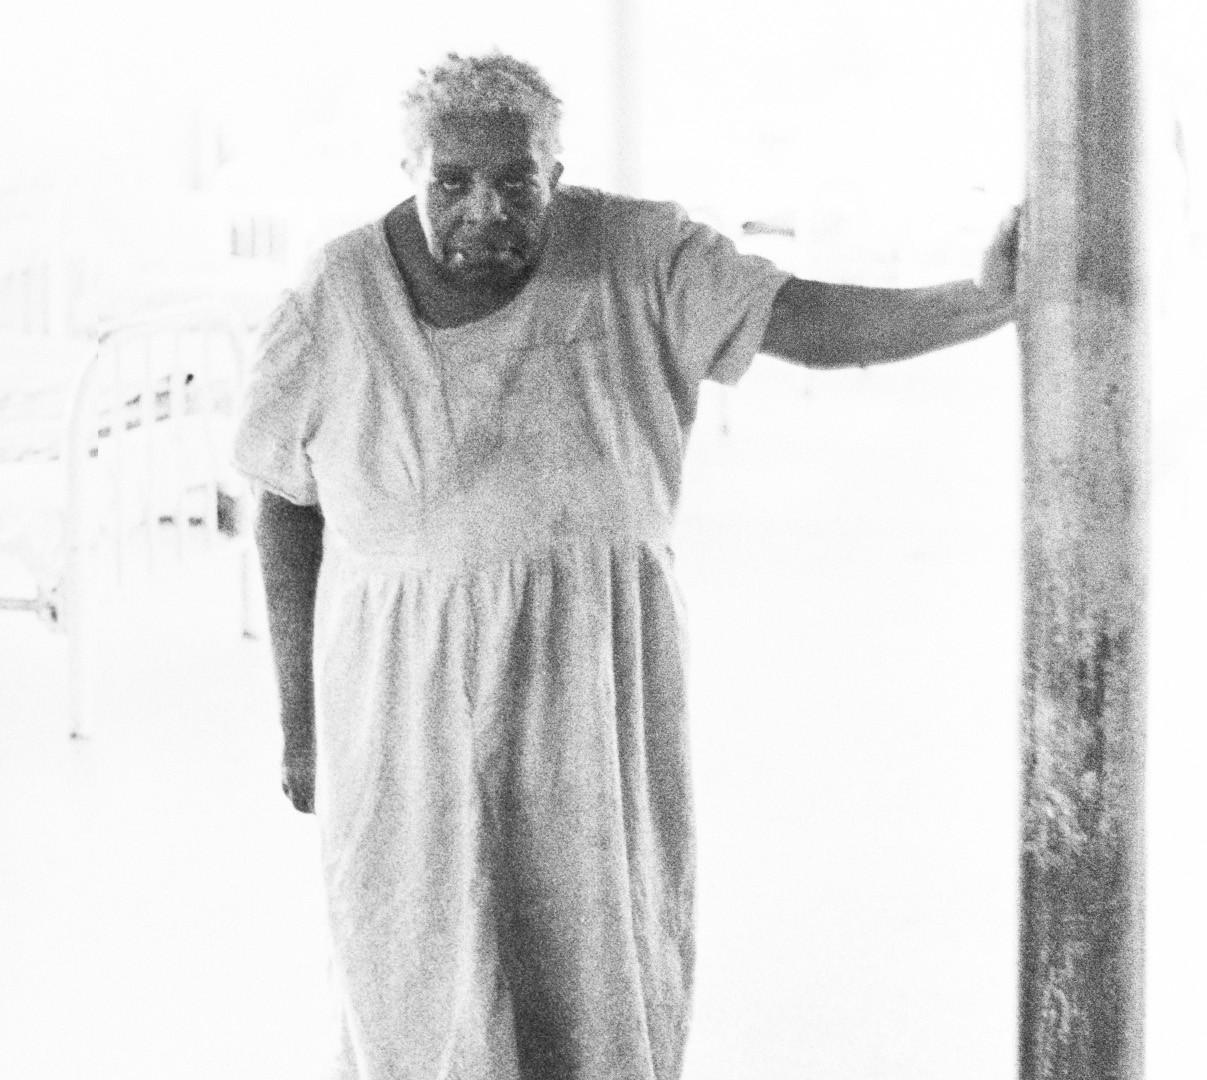 Richard Avedon, Mental Institution #4, East Louisiana State Mental Hospital, Jackson, Louisiana, February 15, 1963